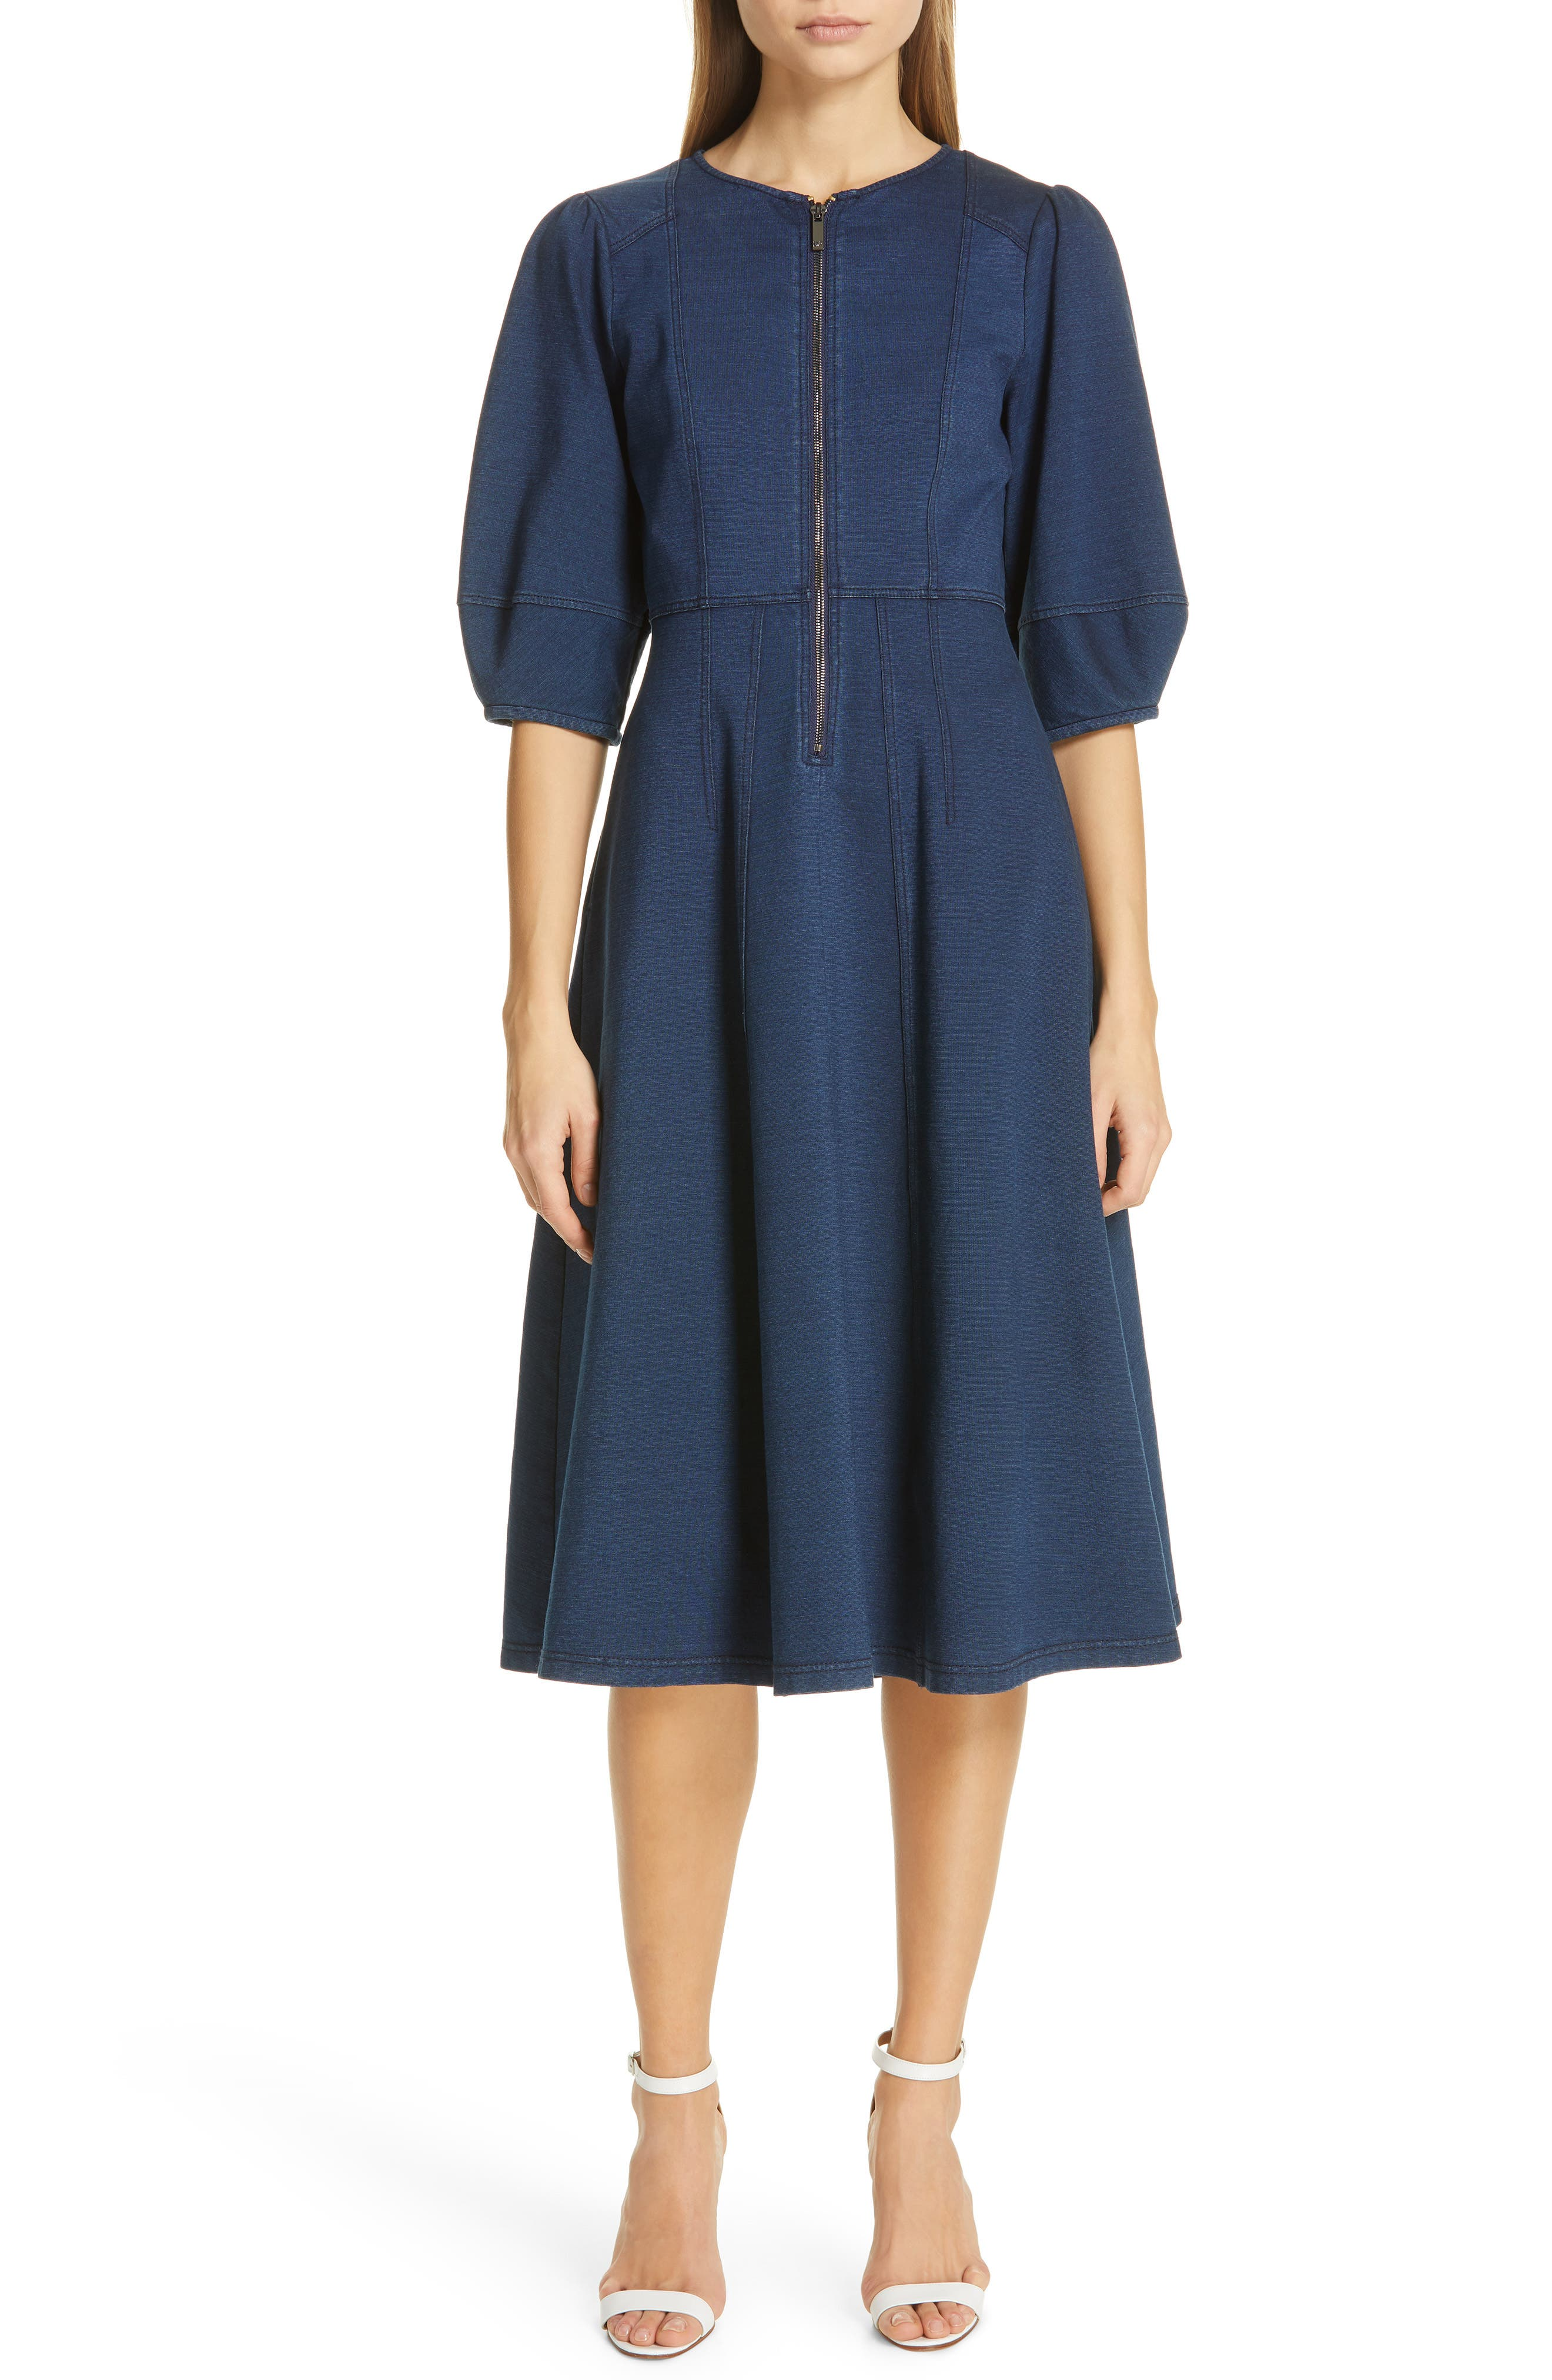 Dvf Thea Balloon Sleeve Zip Front Dress, Blue